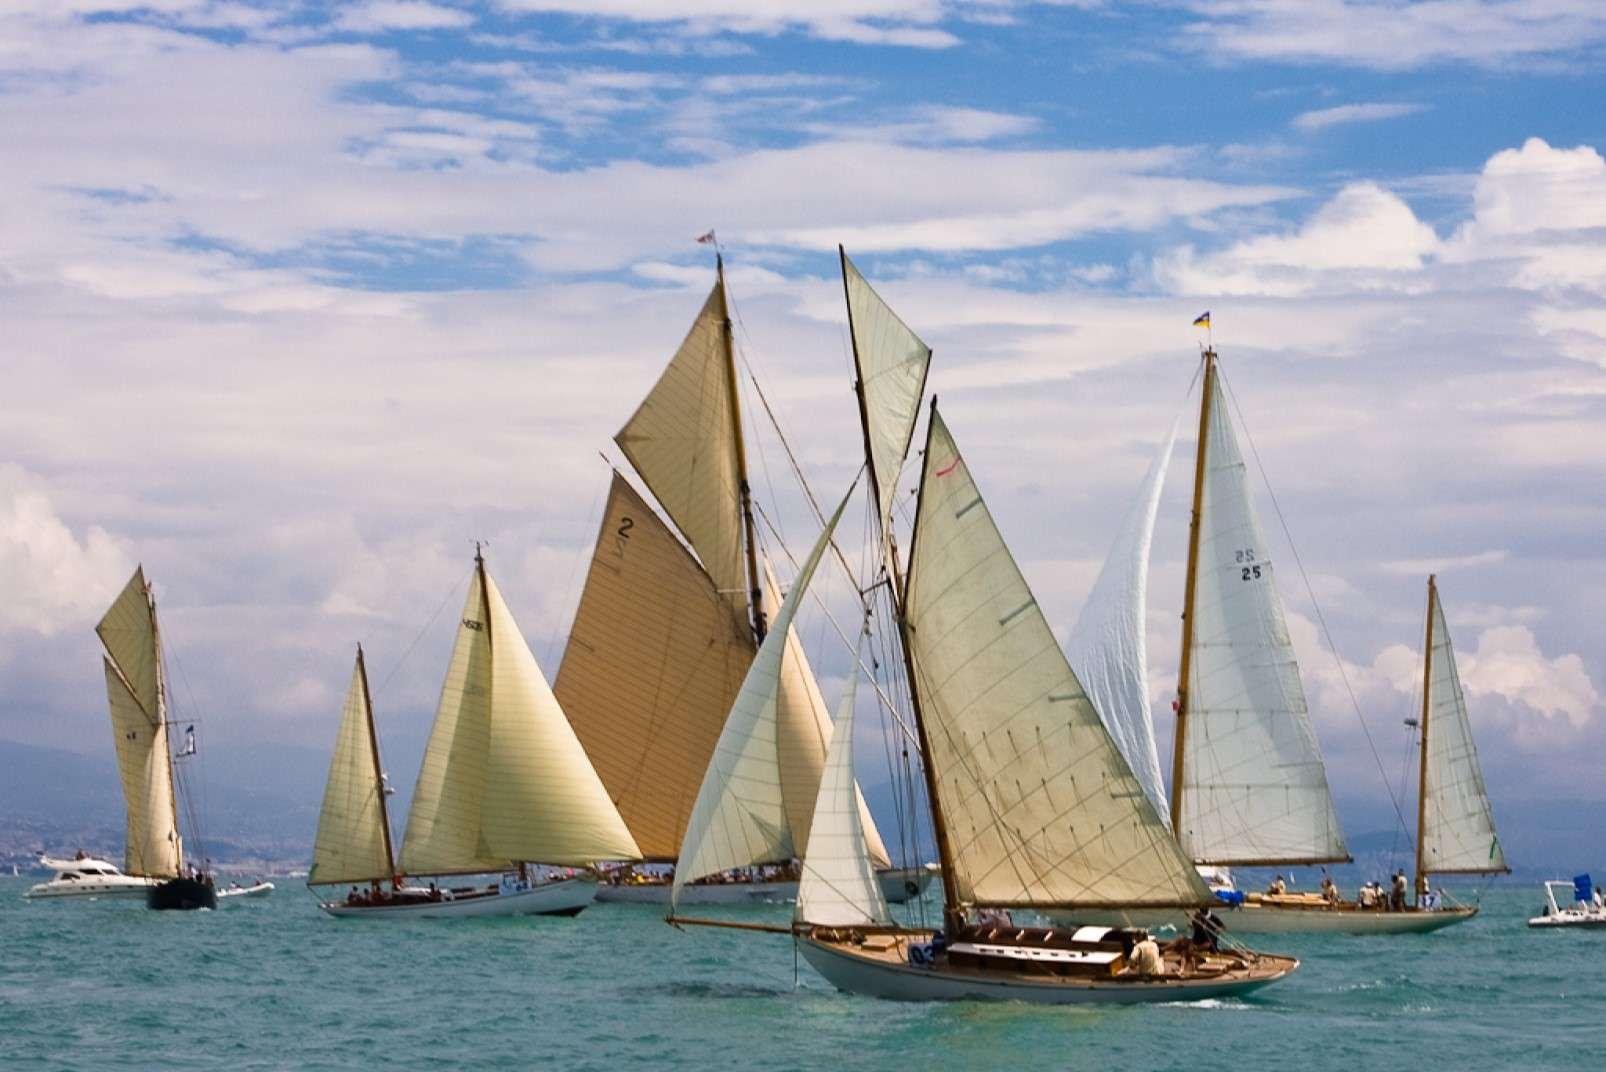 Les Voiles d'Antibes classic yacht regatta